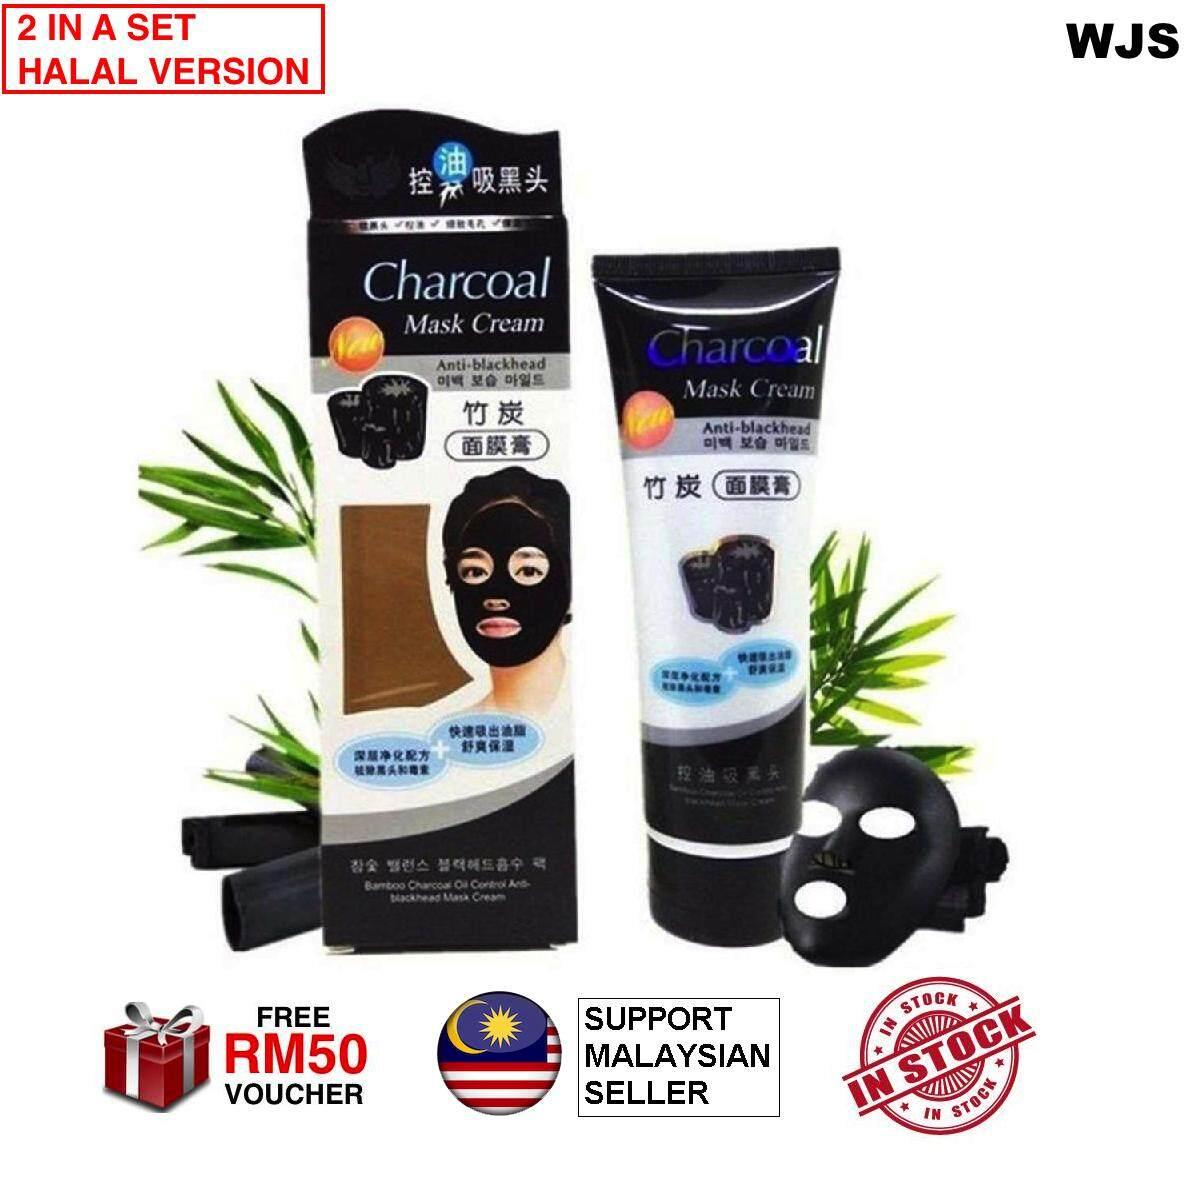 (2 IN A SET + HALAL VERSION) WJS Charcoal Mask Cream Anti Blackhead